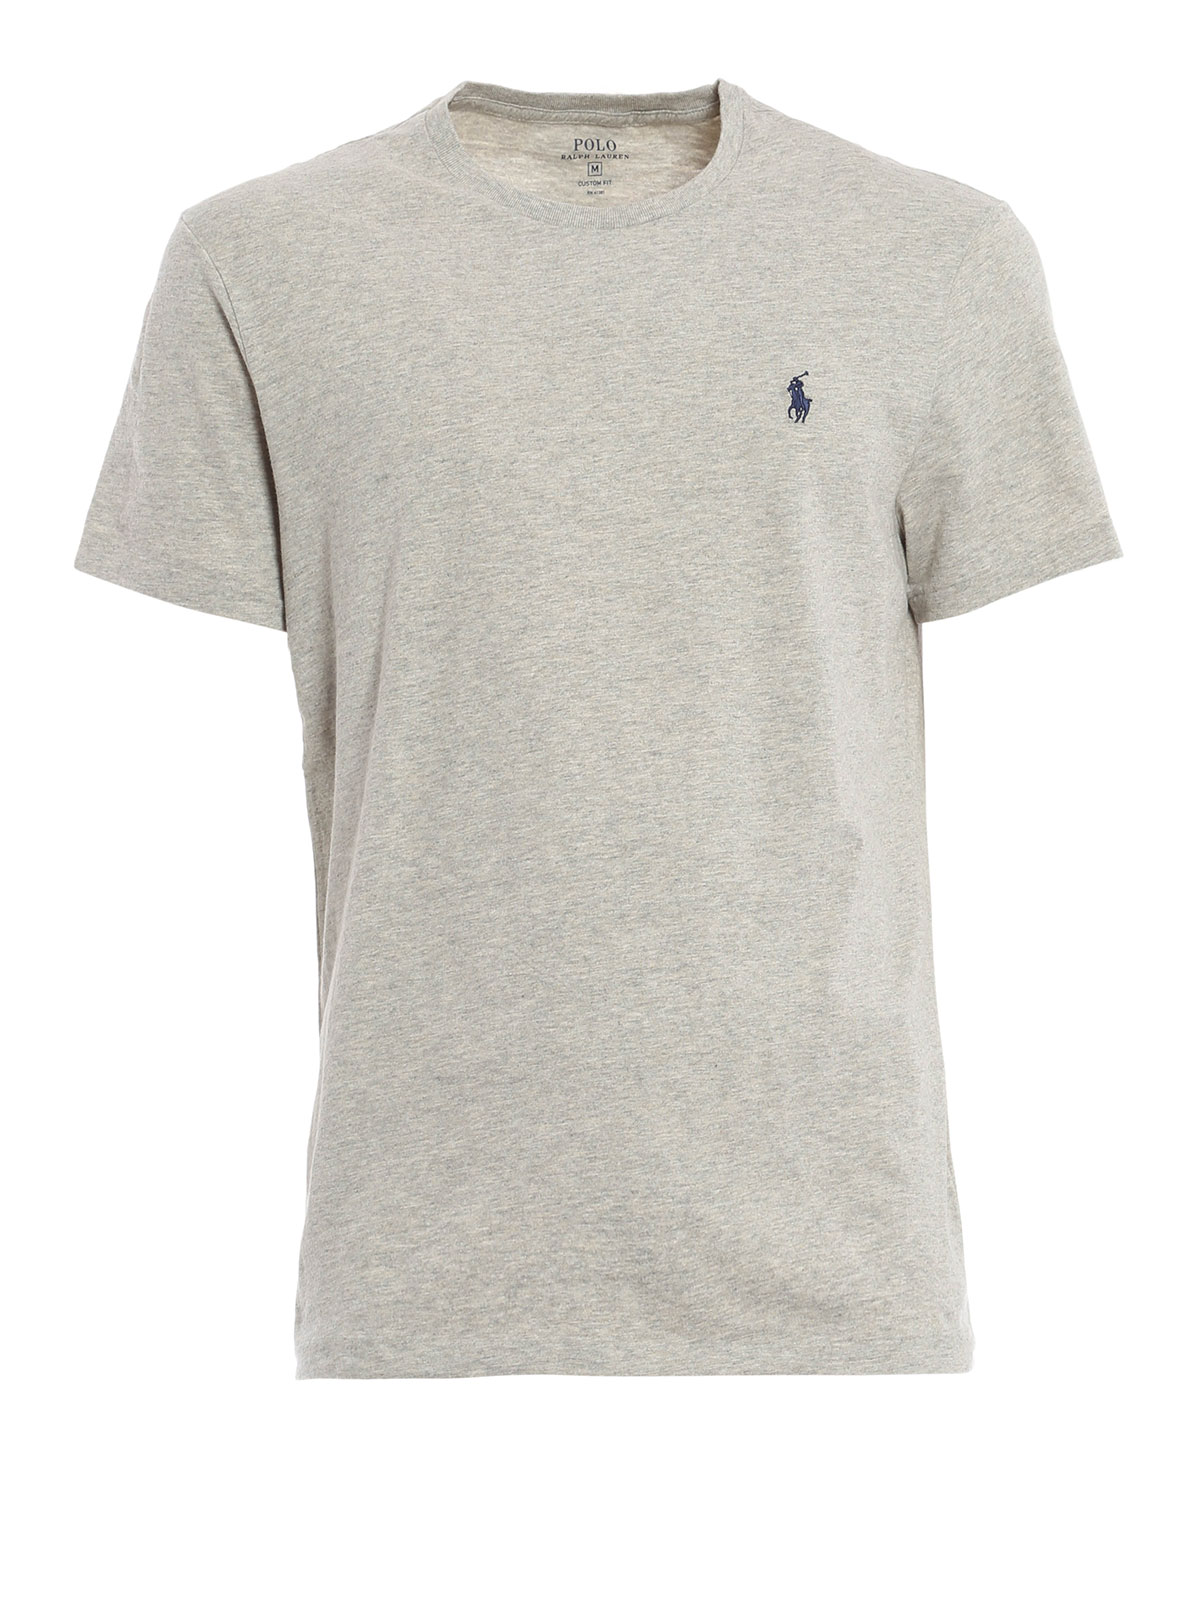 polo ralph lauren cotton t shirt t shirts. Black Bedroom Furniture Sets. Home Design Ideas